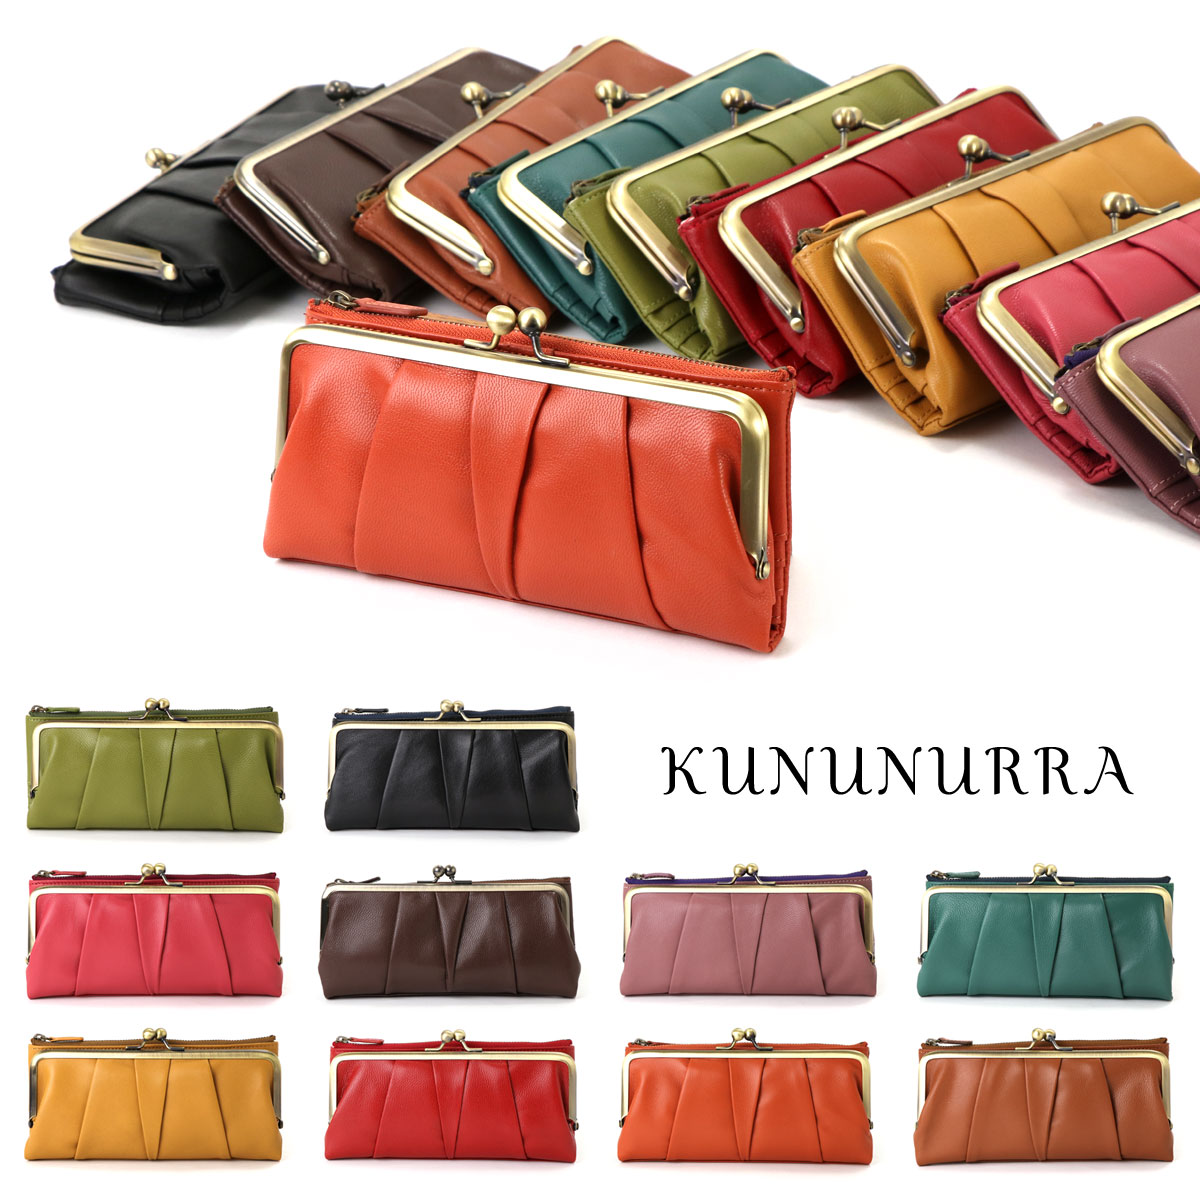 af0c5517a974 ・KUNUNURRAのシープレザーゆるふわプリーツがま口長財布の新色を出品しました。